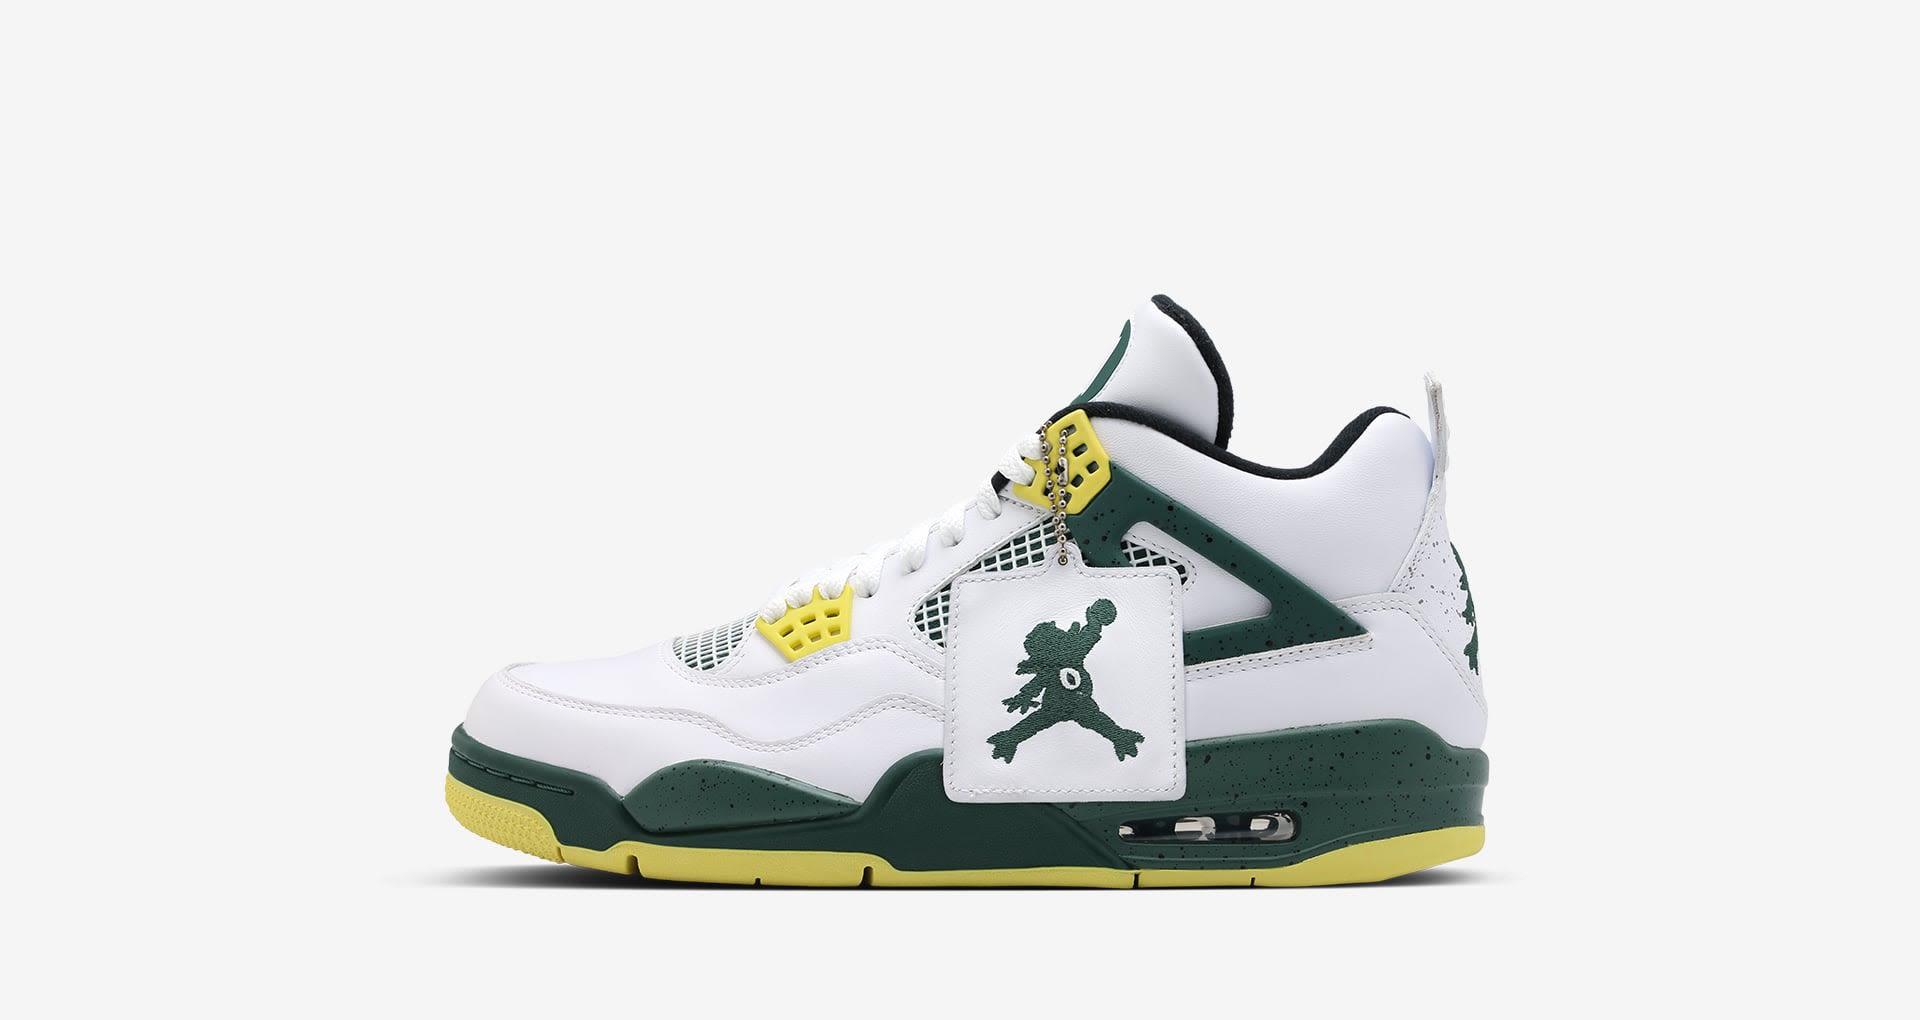 5061a75514e5 Inside the Vault  Oregon Ducks x Jordan Brand. Nike+ SNKRS